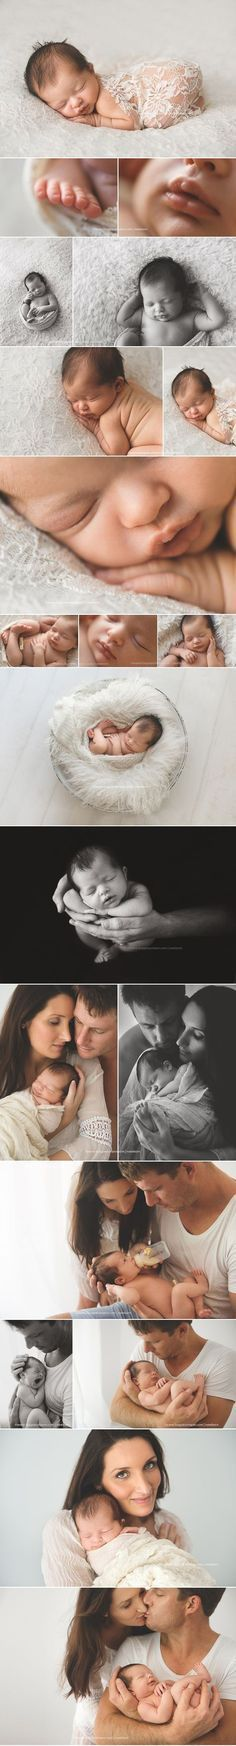 Matilda   Perth Maternity and Newborn Photographer » Perth Baby Photographer Lisa Goessmann Modern Photography Newborn Photography babies and pregnancy